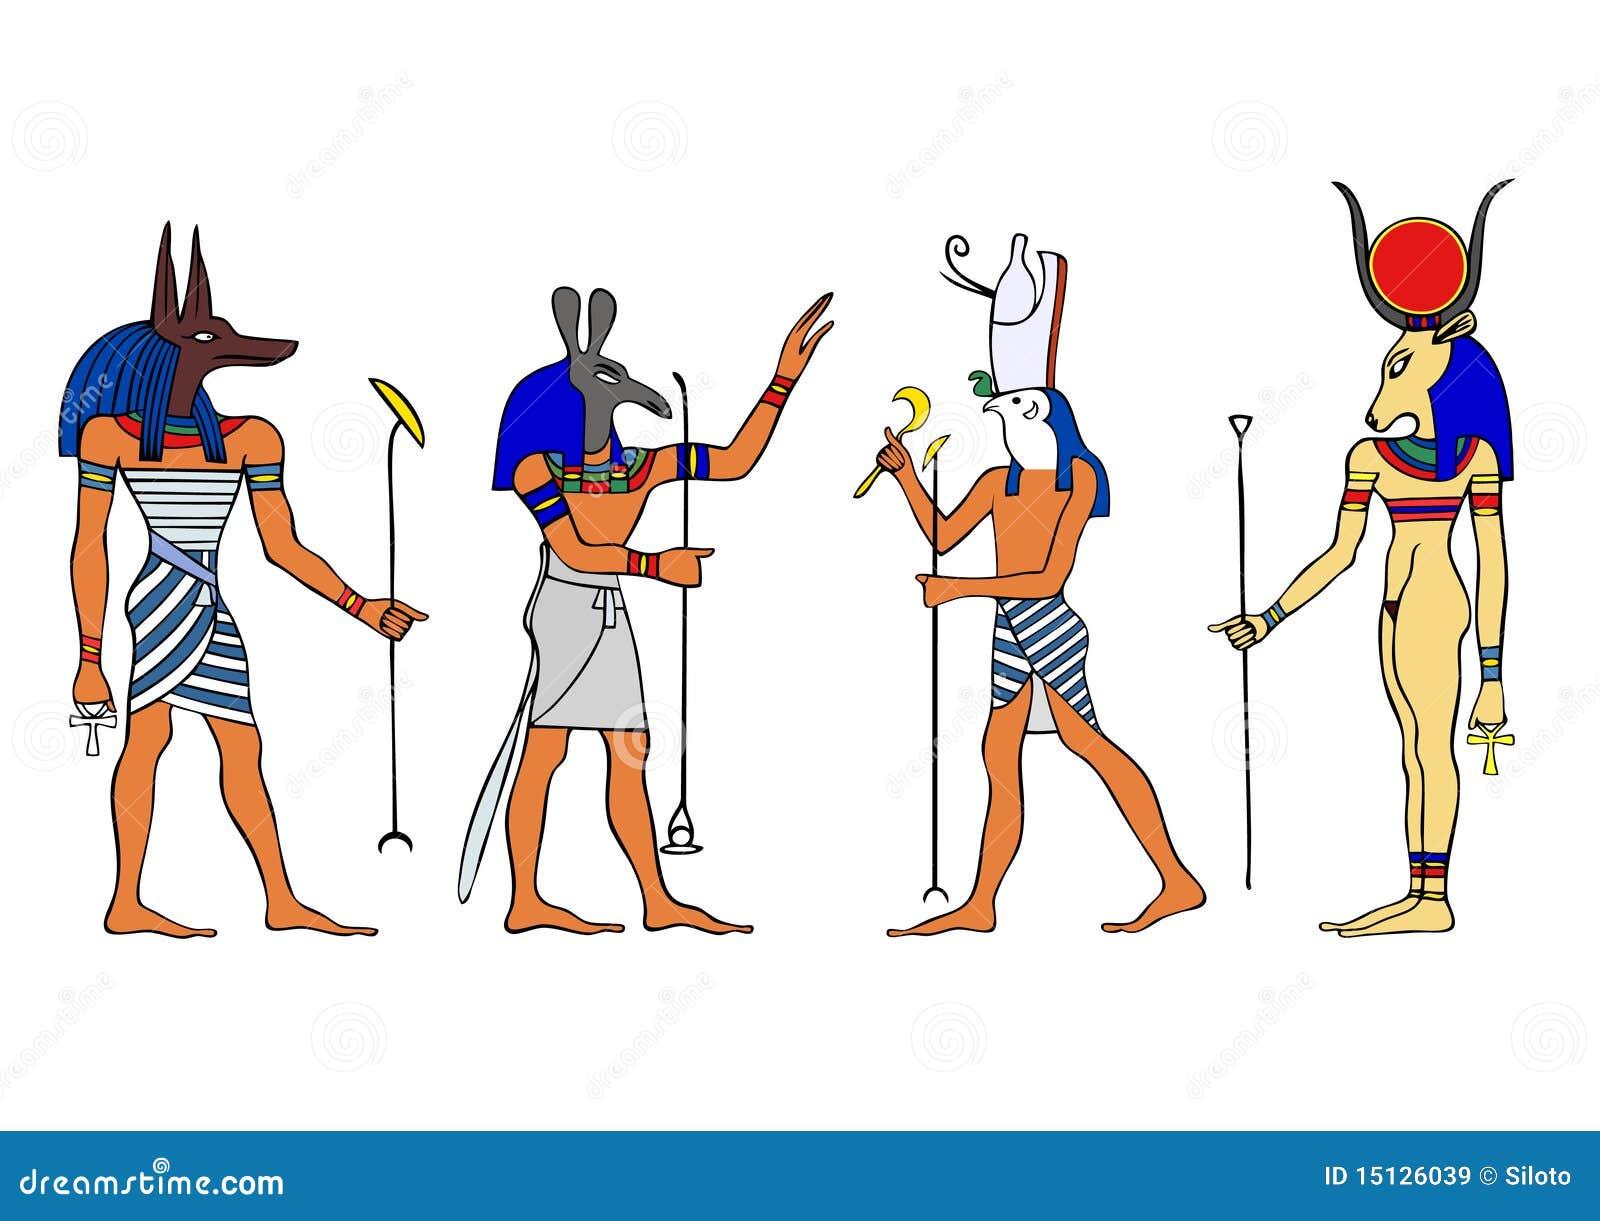 Alive Character Design Pdf Download : Egyptian gods and goddess stock illustration